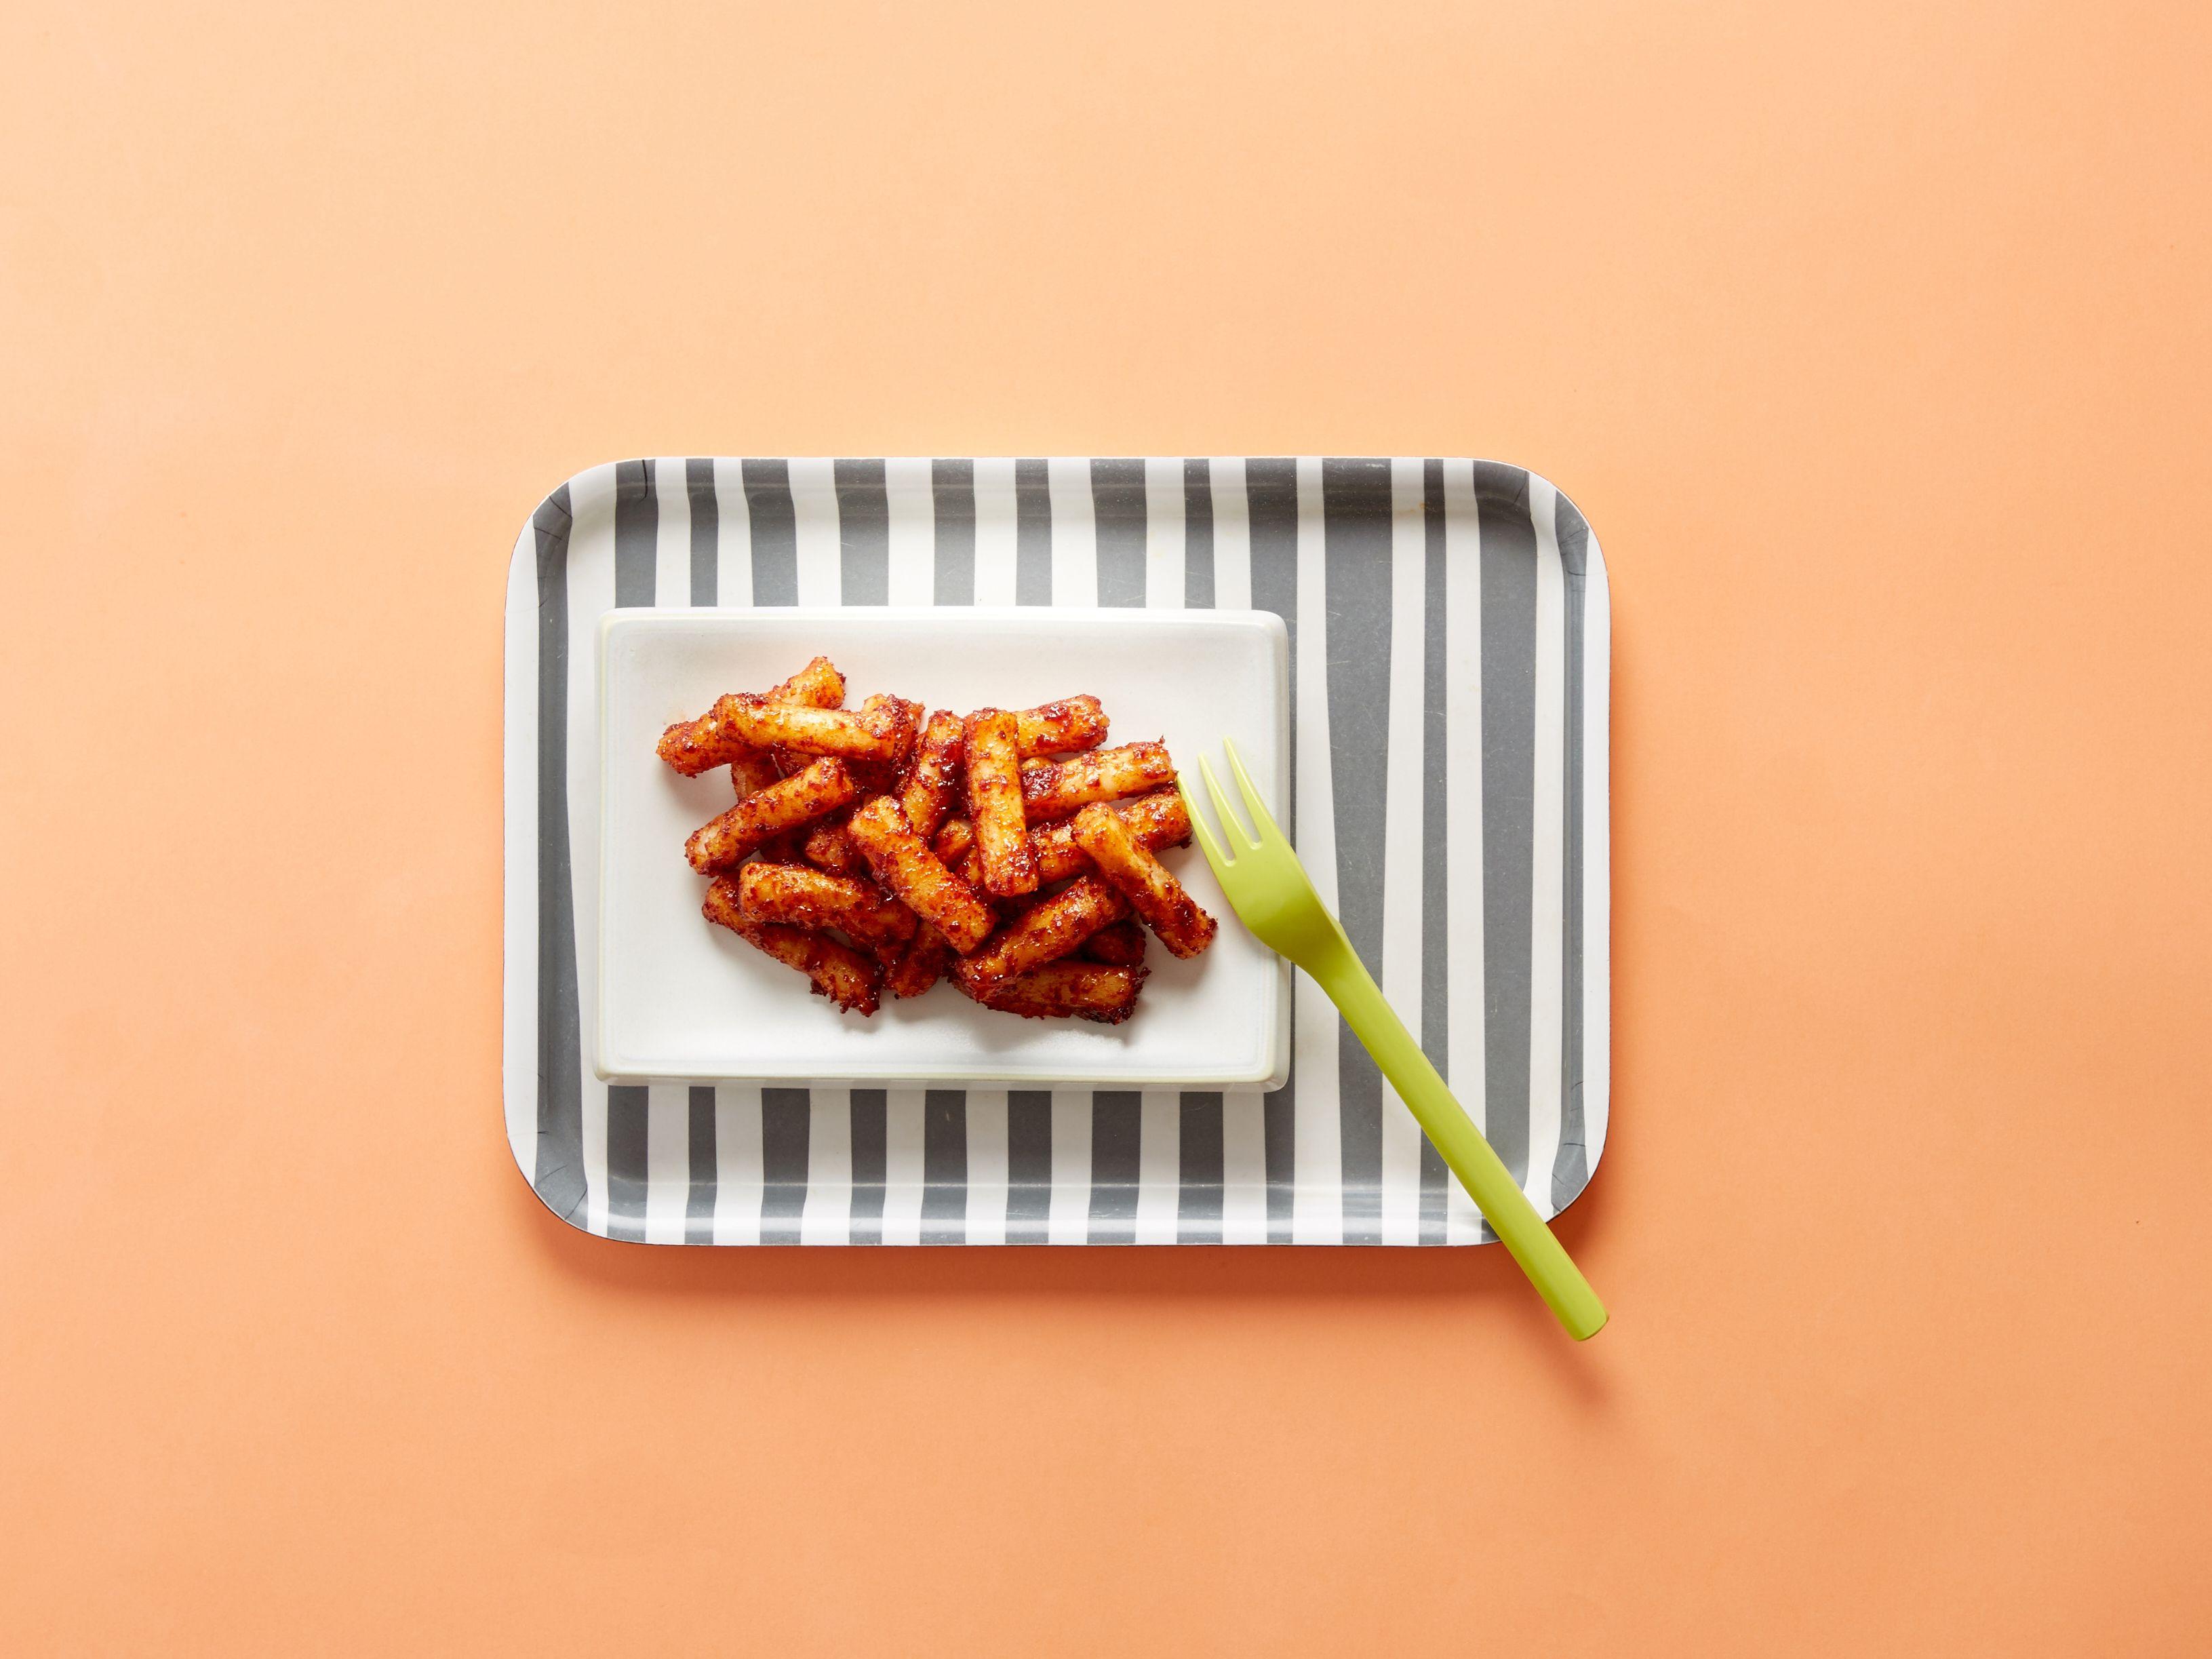 tteokbokki(korean spicy ricecake)